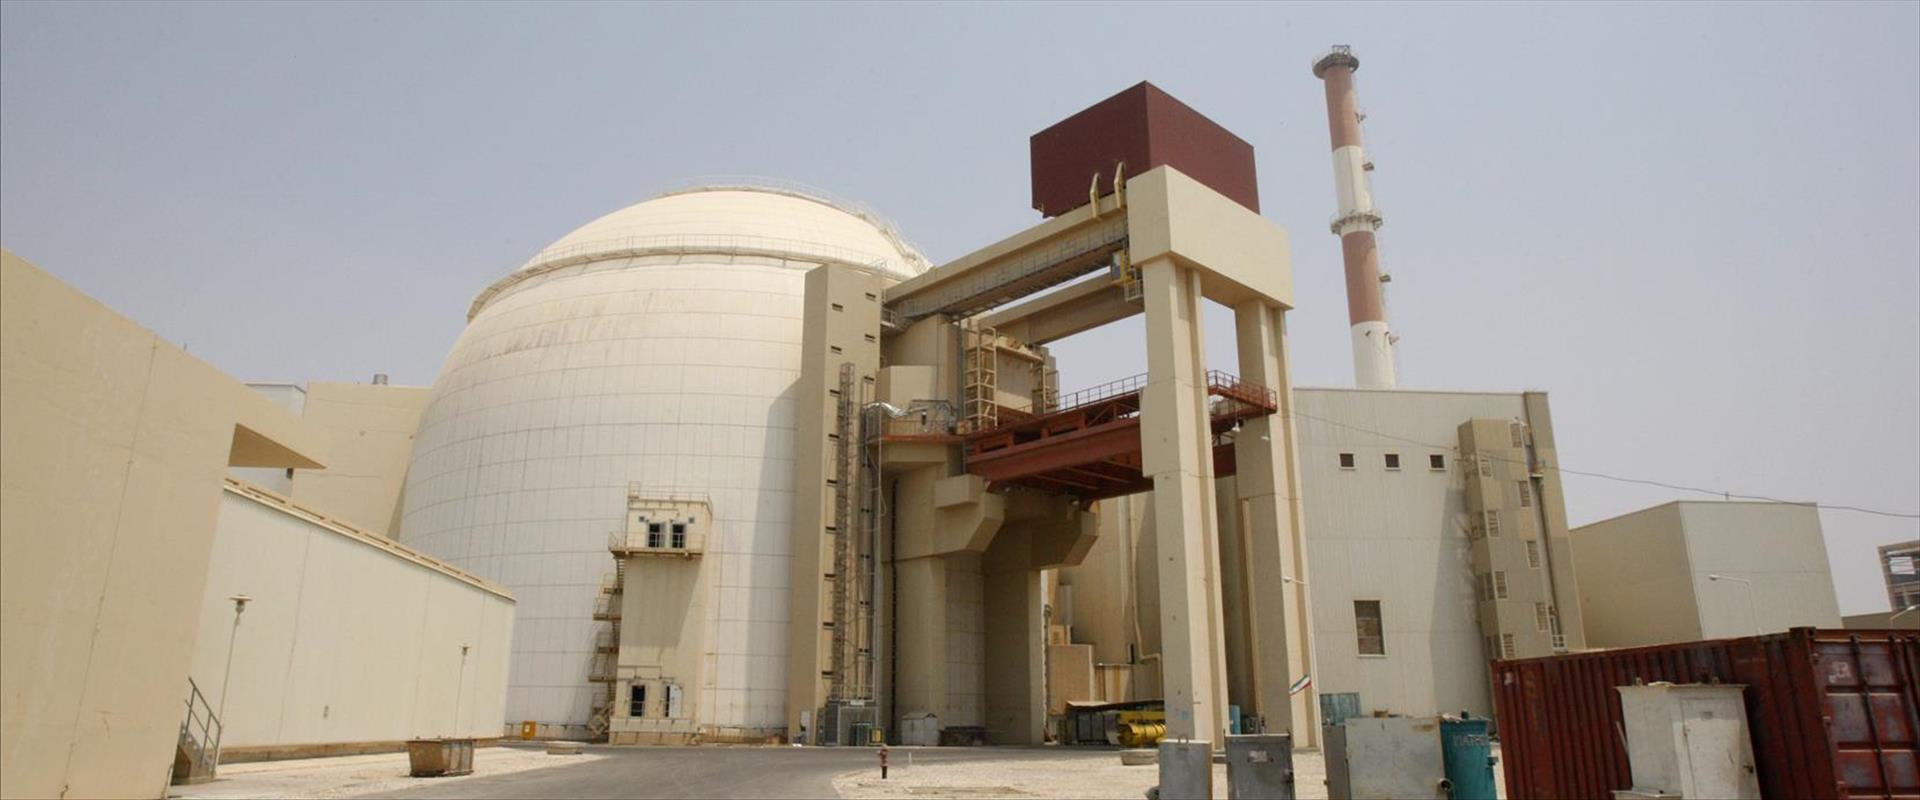 Israël/Iran : l'Iran s'approche dangereusement de son seuil nucléaire